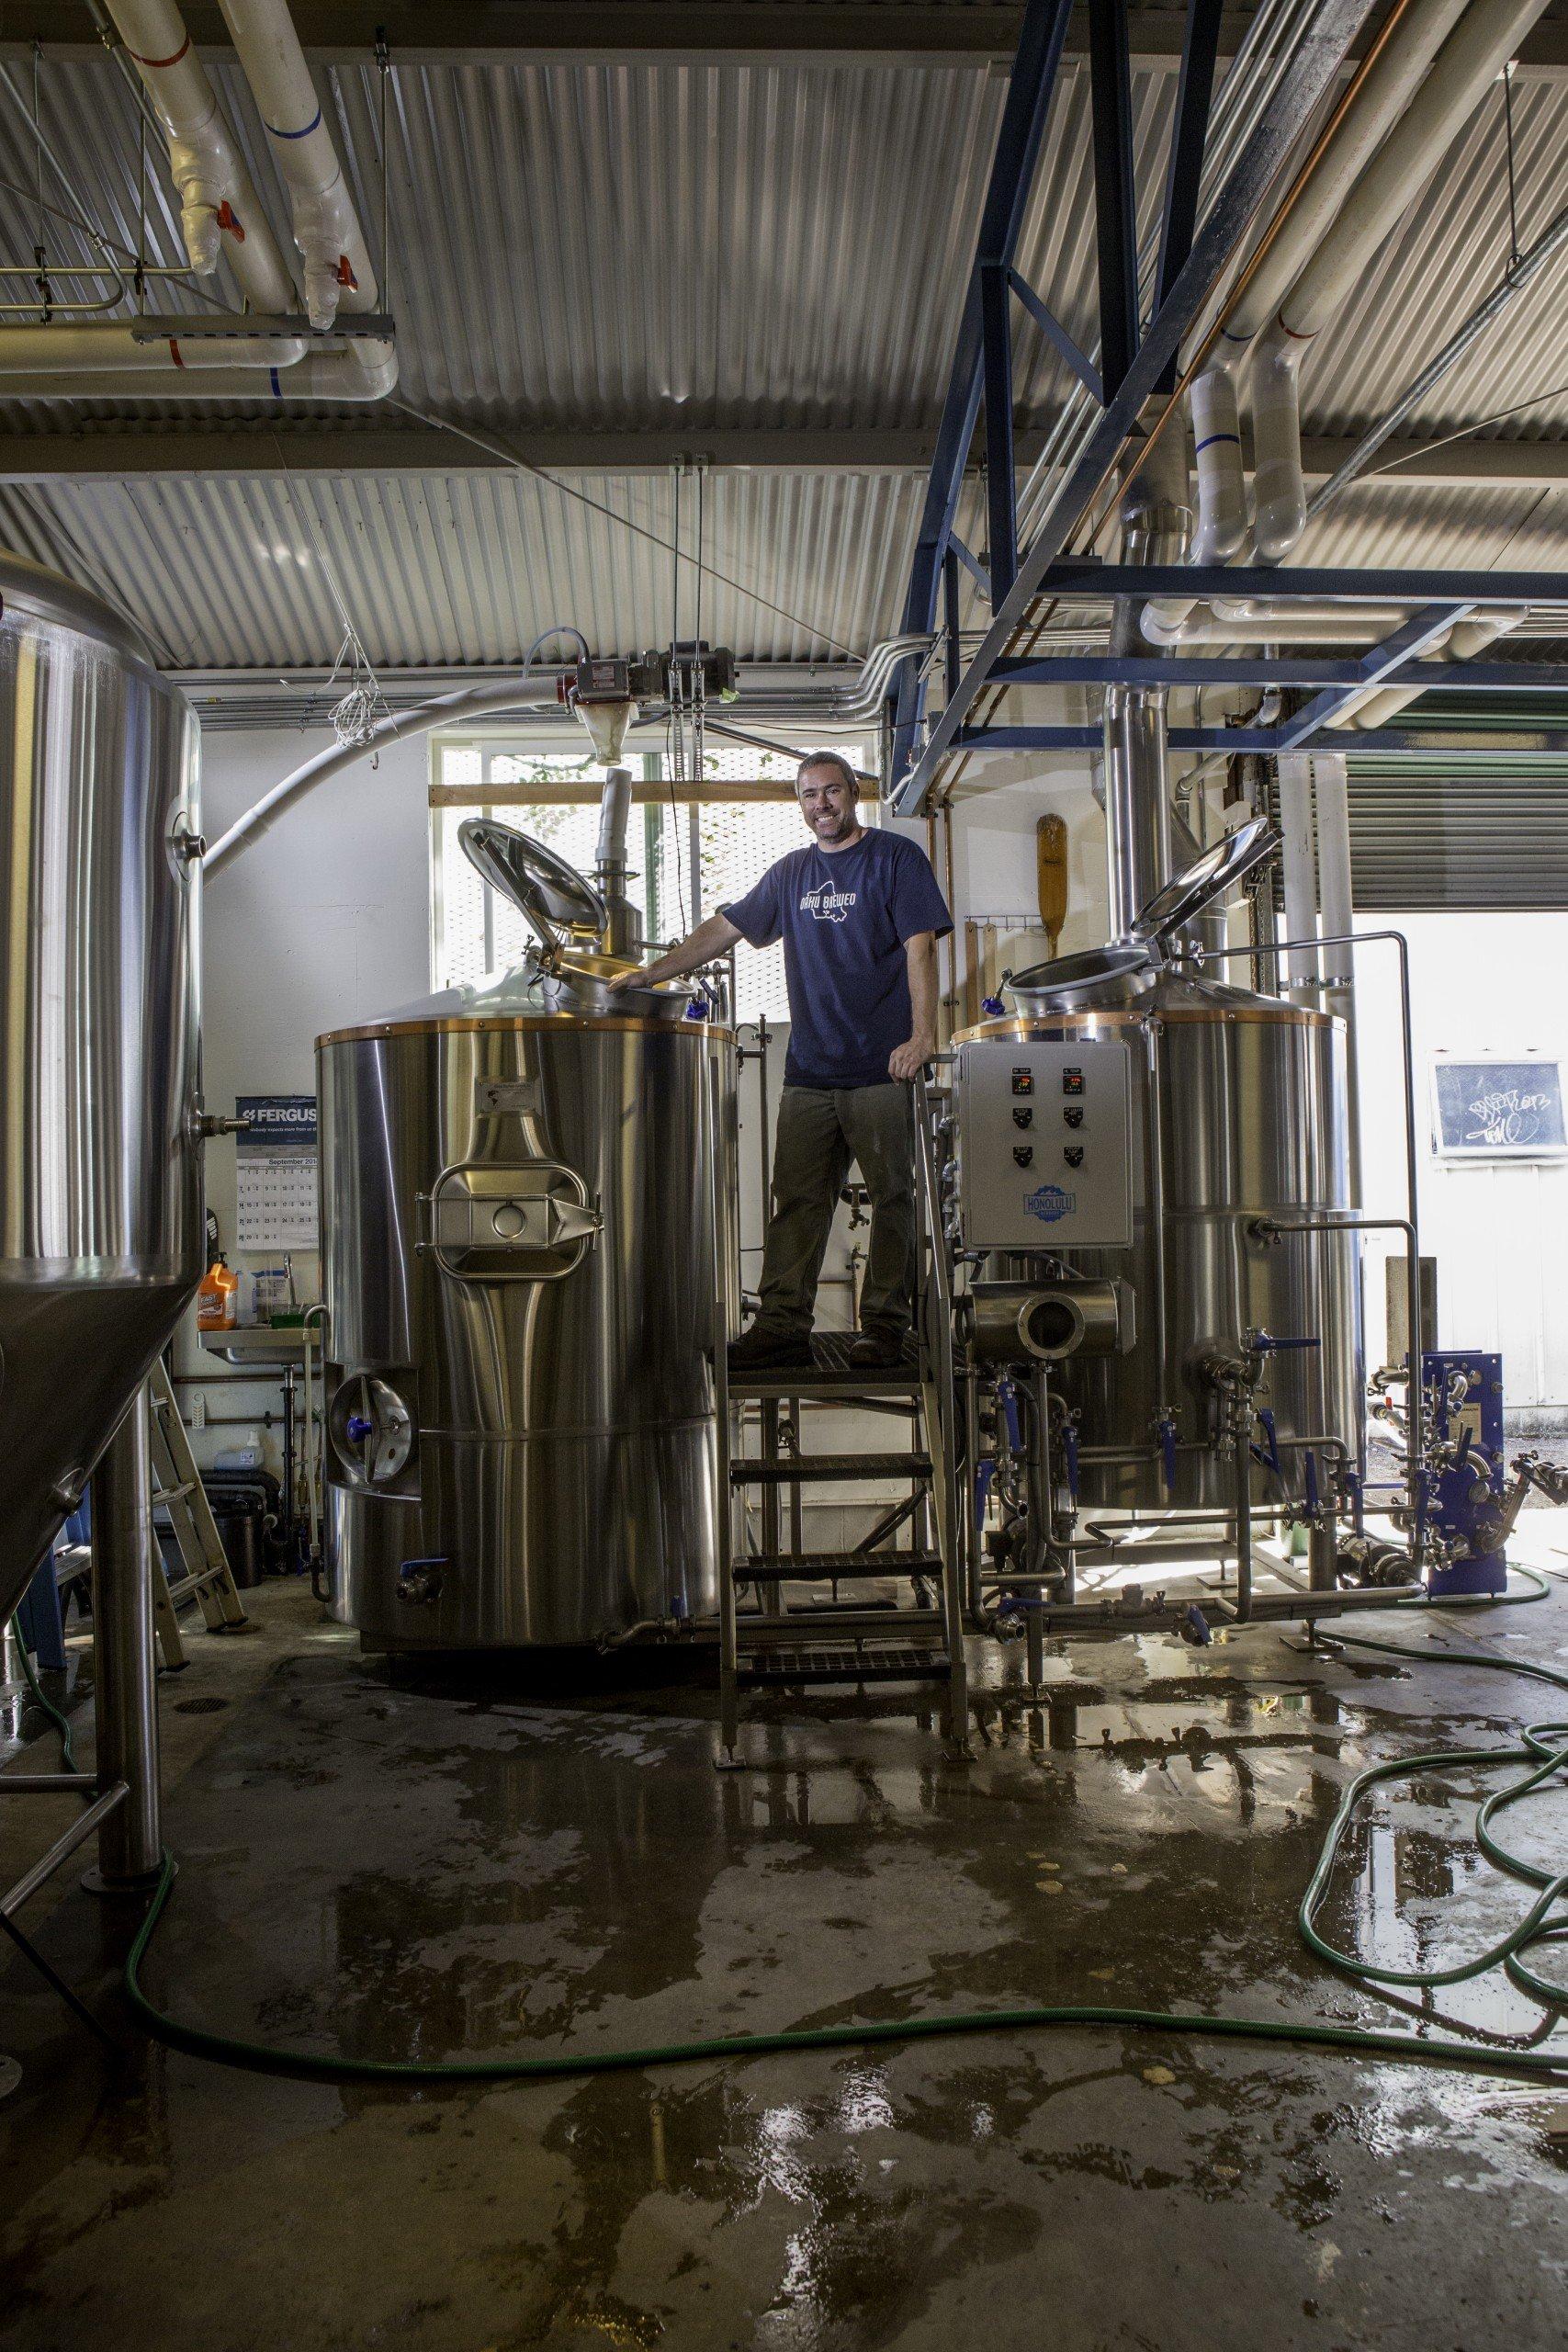 Geoff Seideman had been assistant brewmaster at Aloha Beer before launching Honolulu Beerworks. Photo: David Croxford